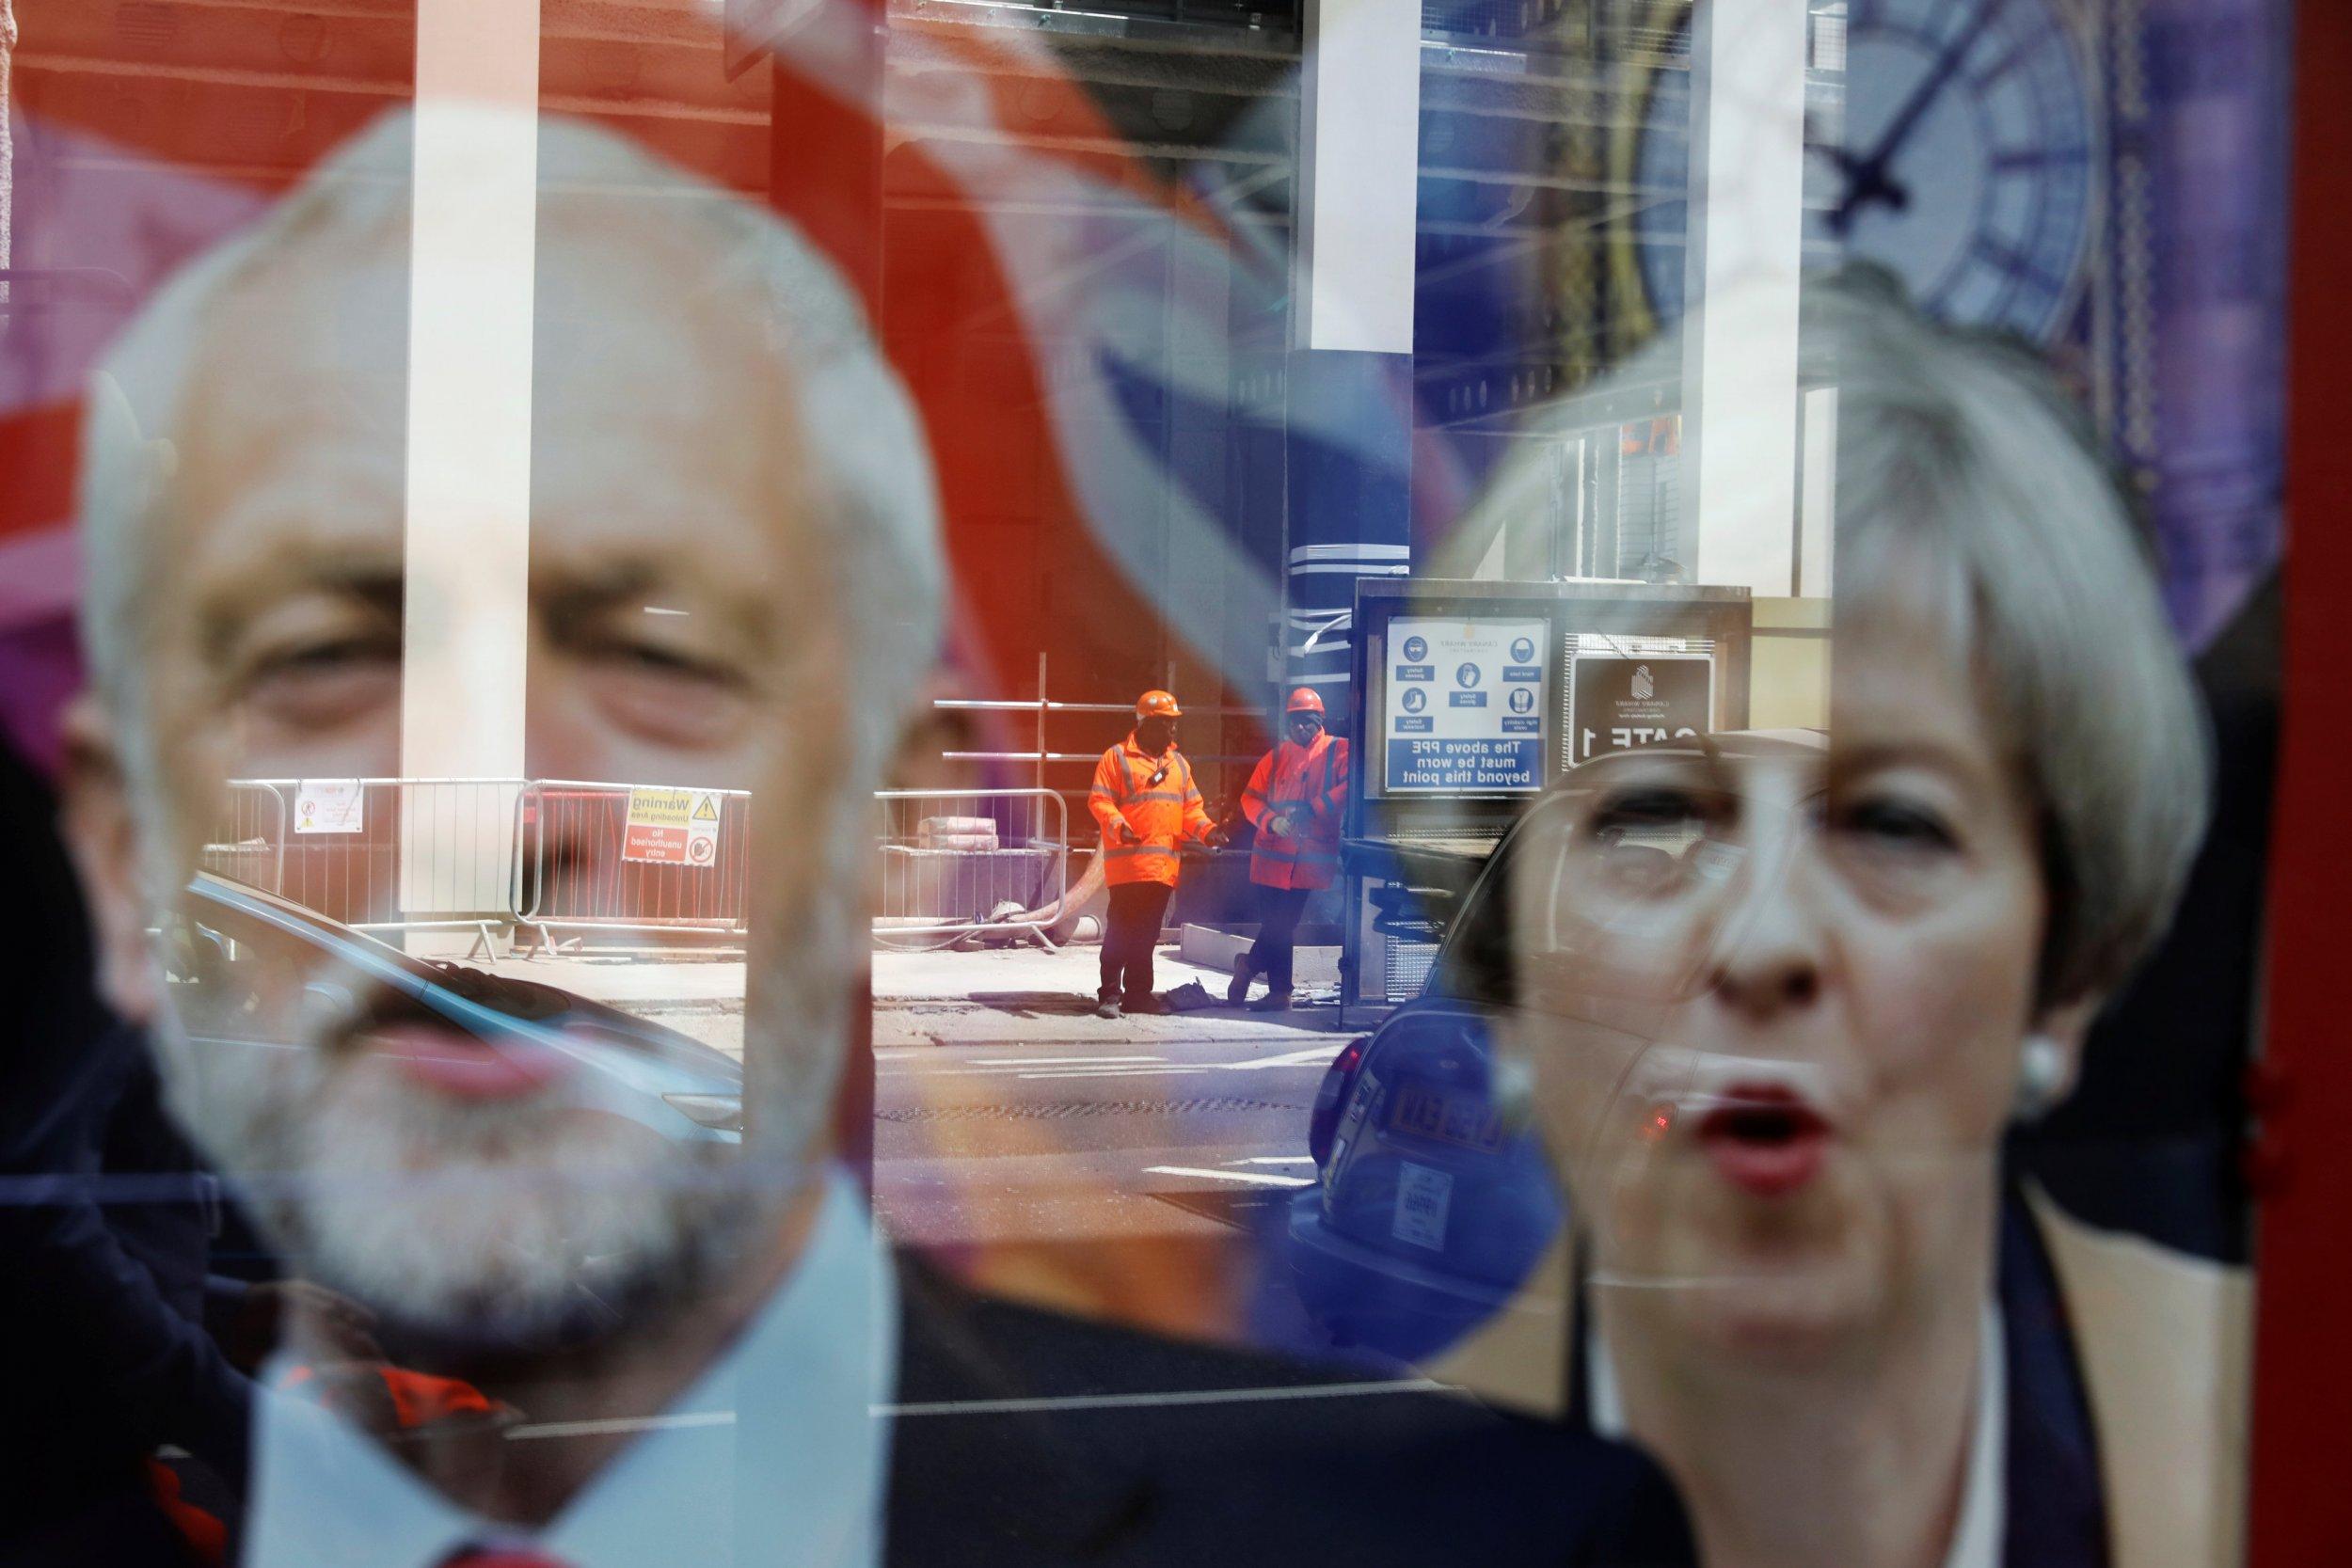 Theresa May/Jeremy Corbyn